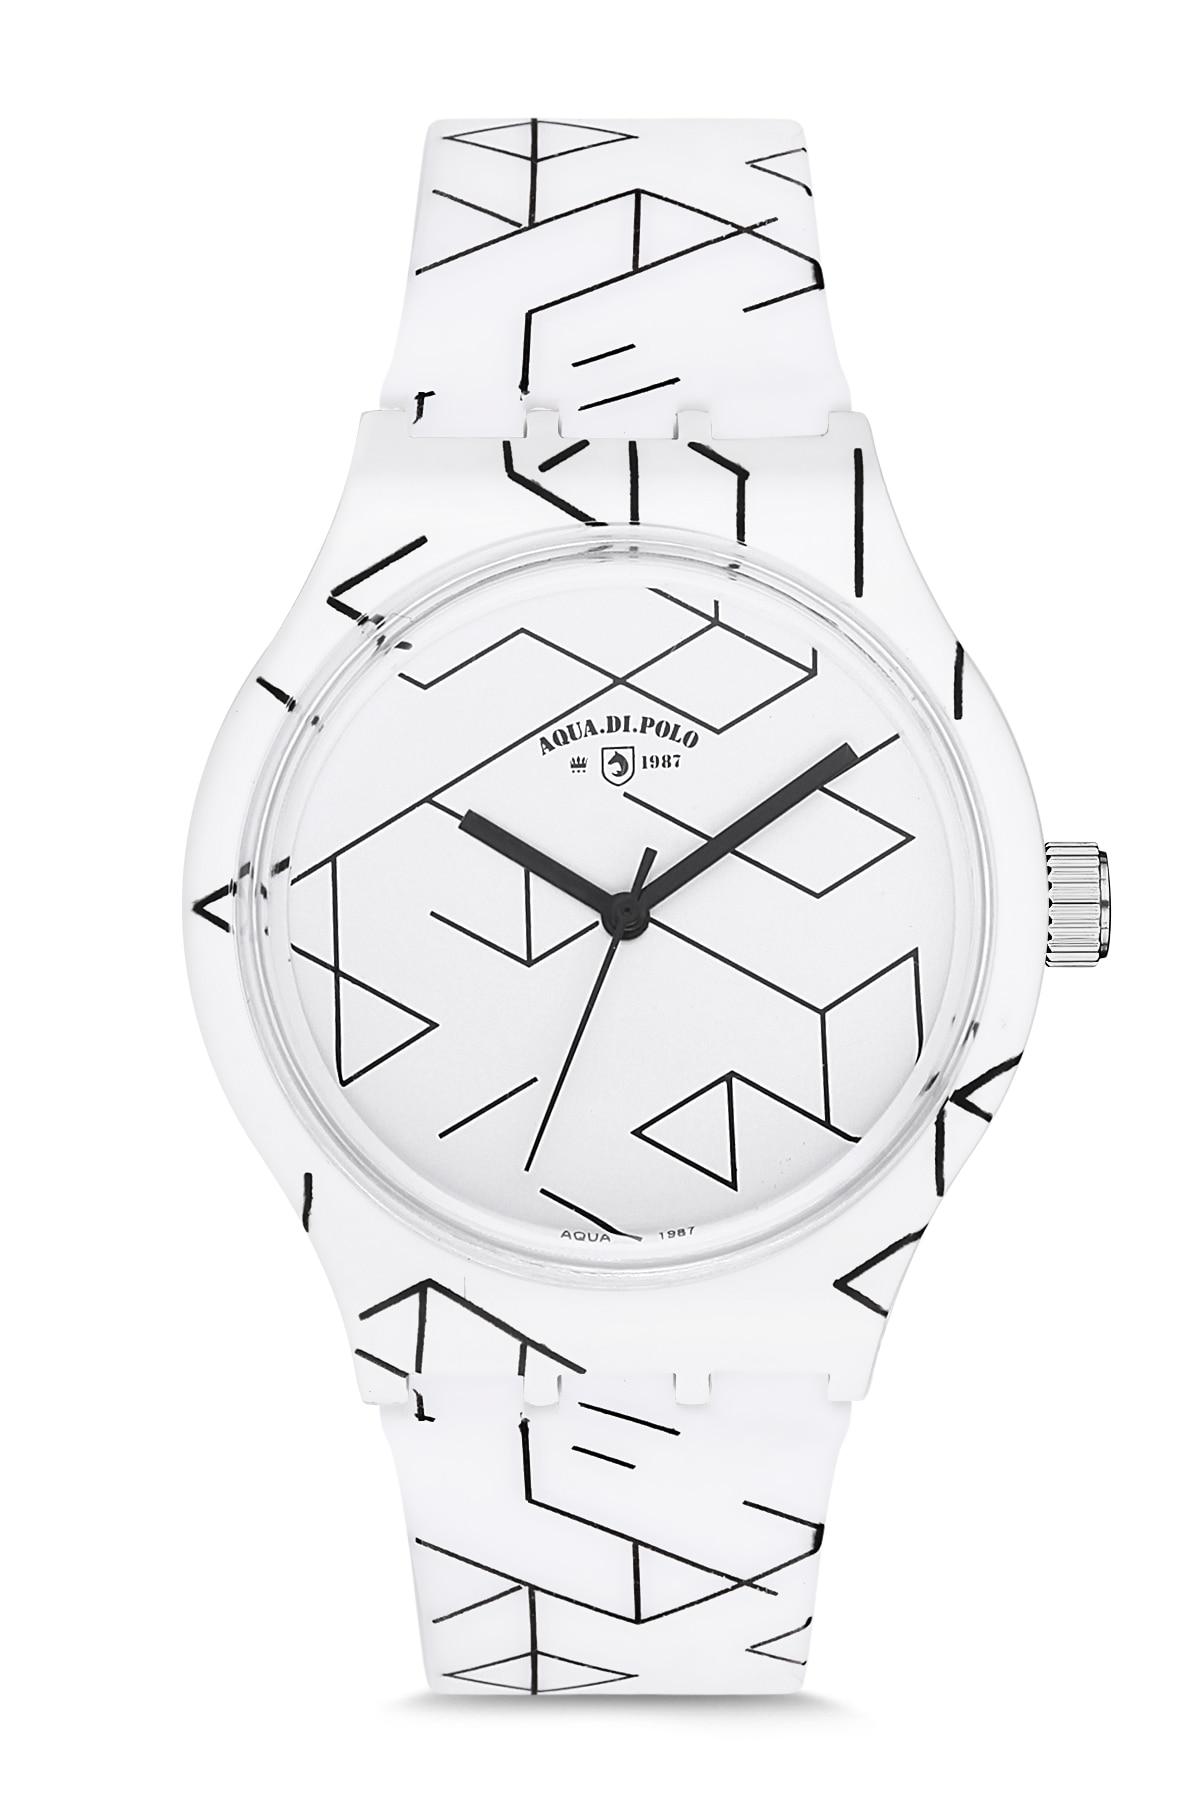 Aqua Di Polo APSV1-A5531-US555 Silicon Unisex Wristwatch Woman Men Fashion Silicone Band Wrist Watch Simple Style Geometric Pat